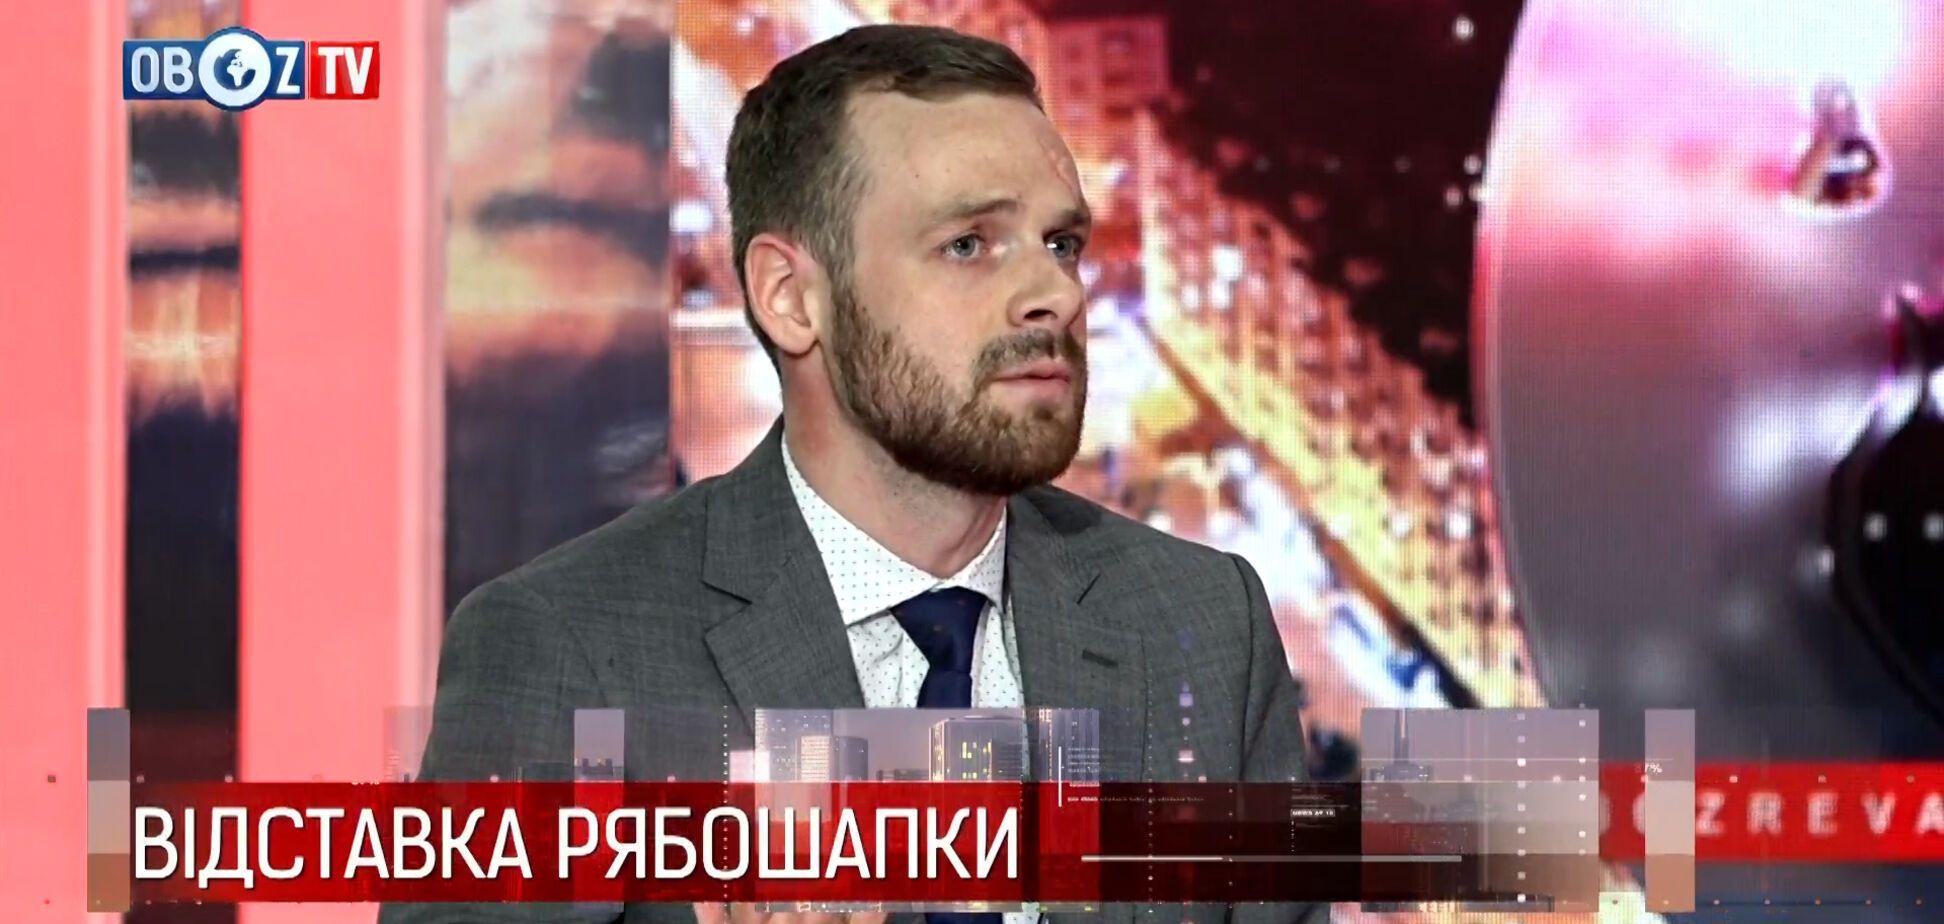 Отставка Рябошапки: за что уволили генпрокурора